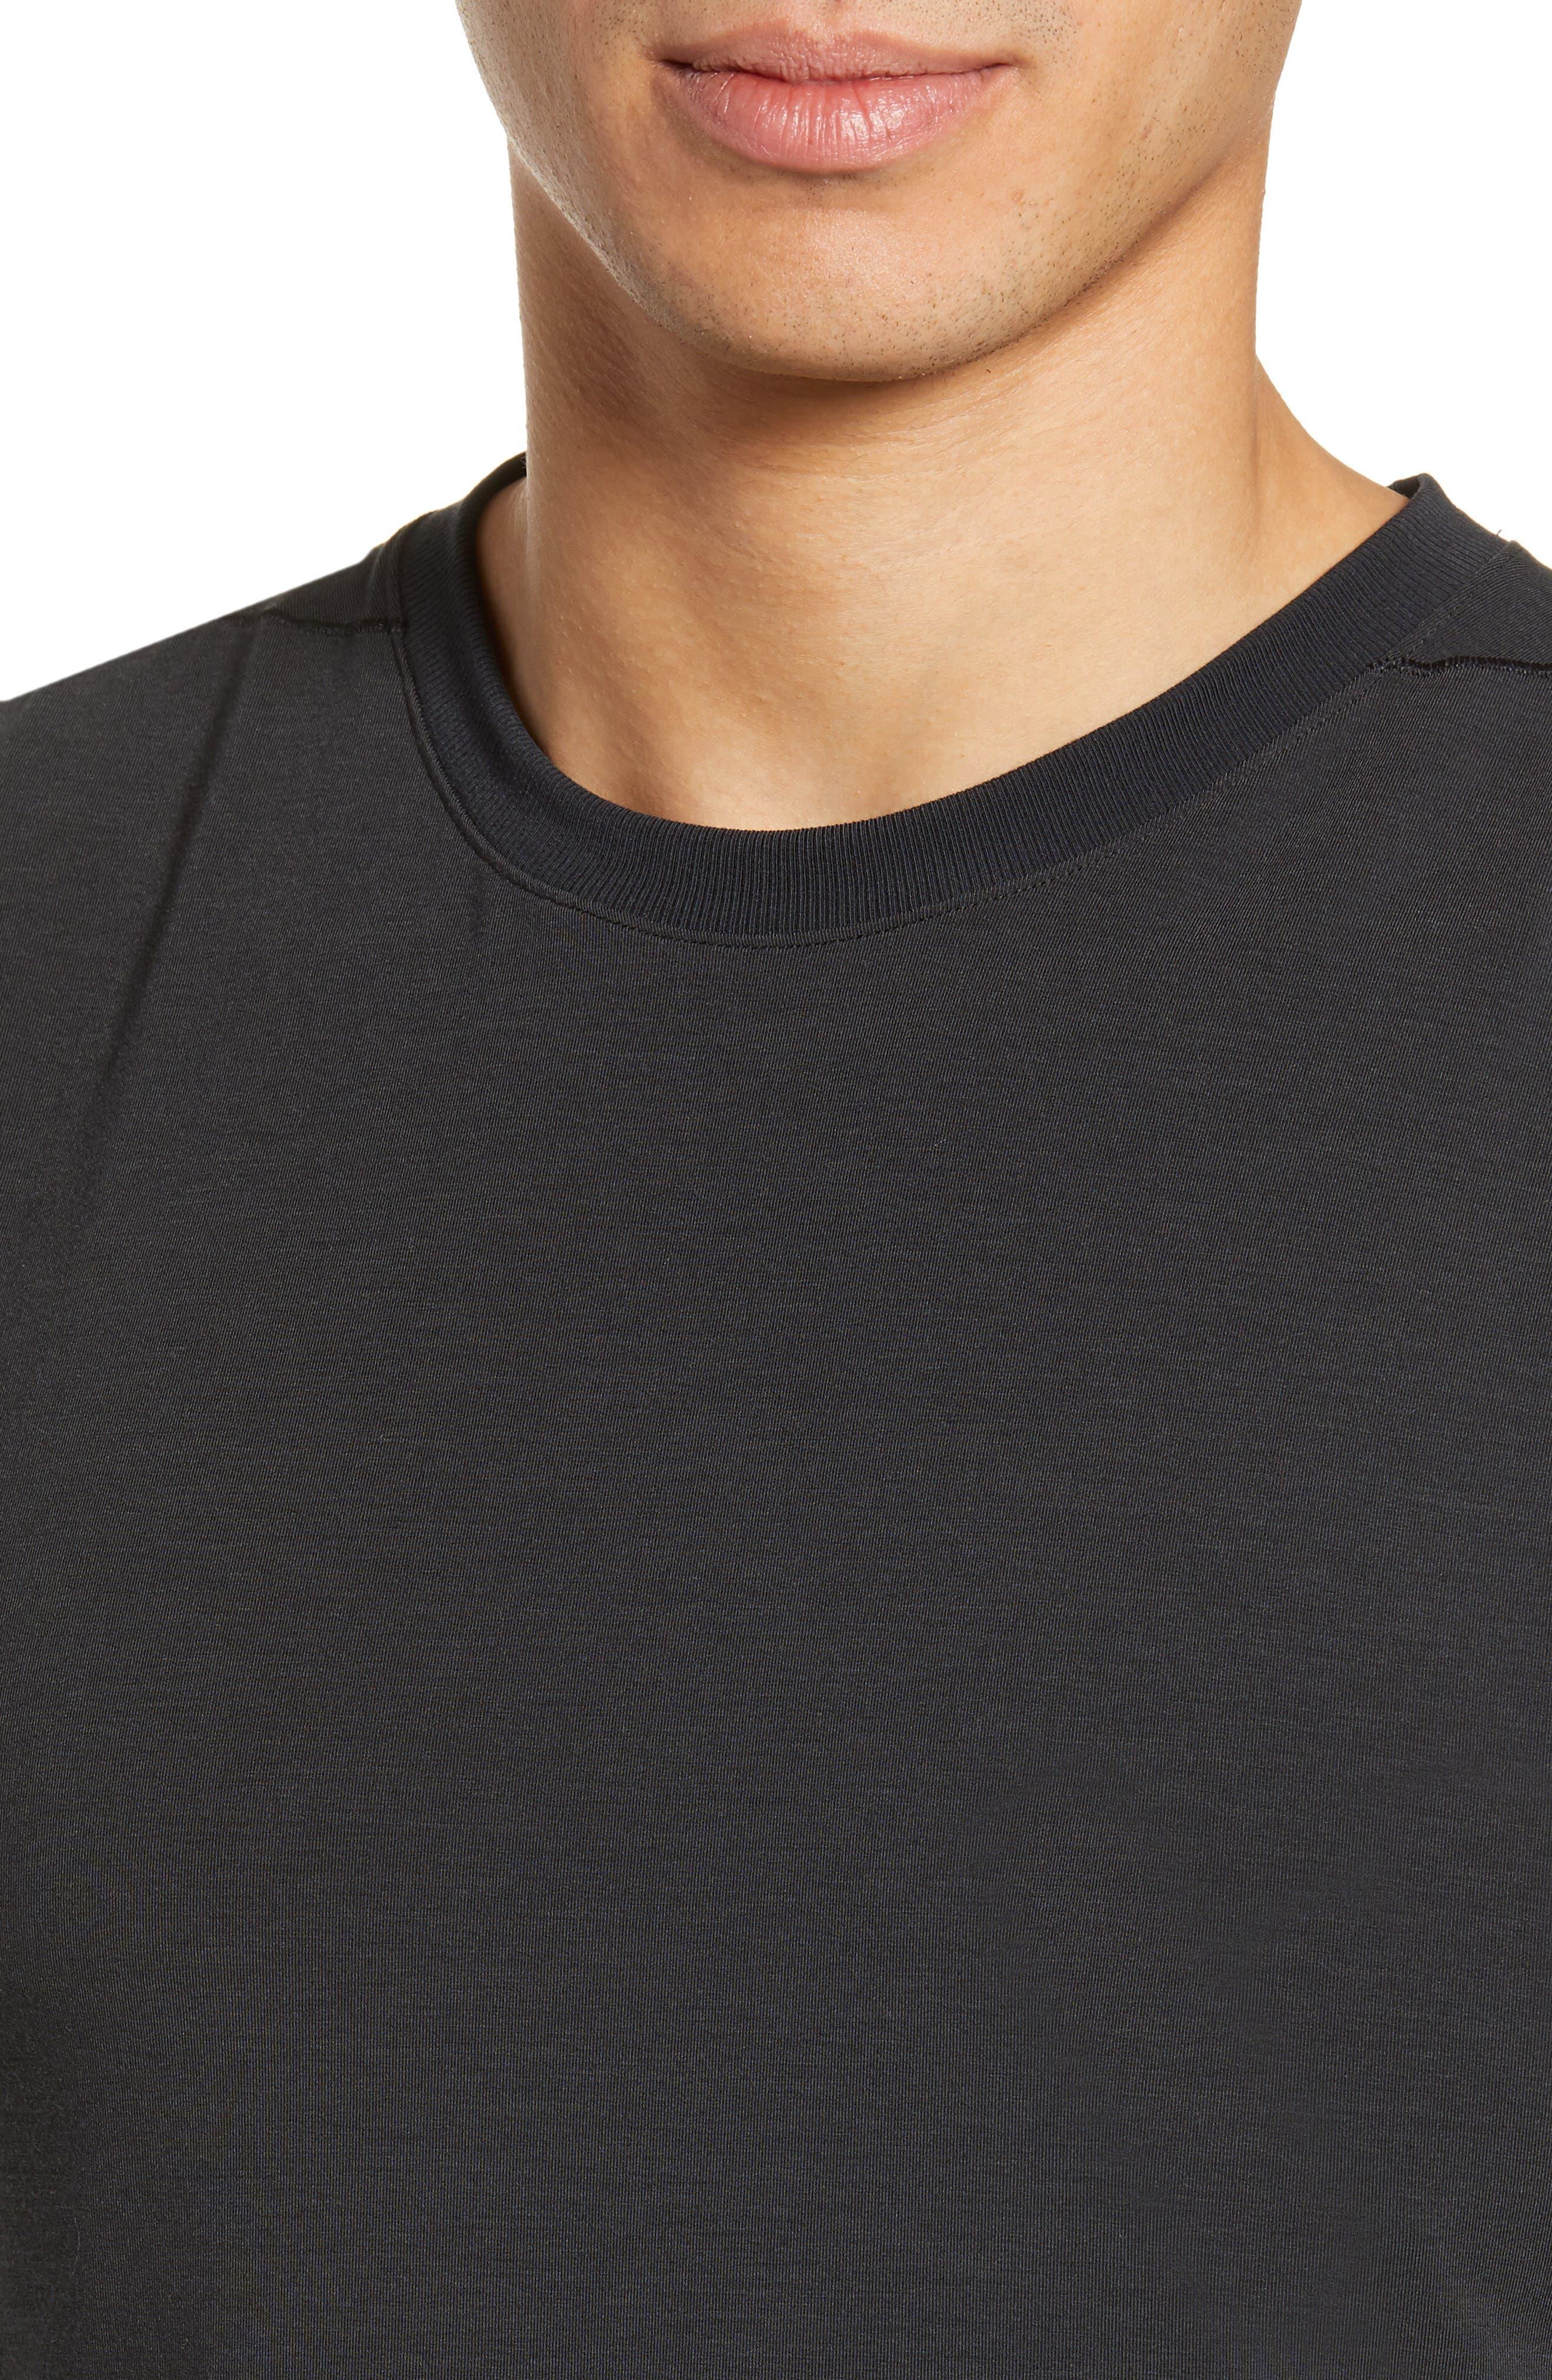 NIKE, Dry Transcent Sleeveless T-Shirt, Alternate thumbnail 4, color, BLACK/ DARK GREY